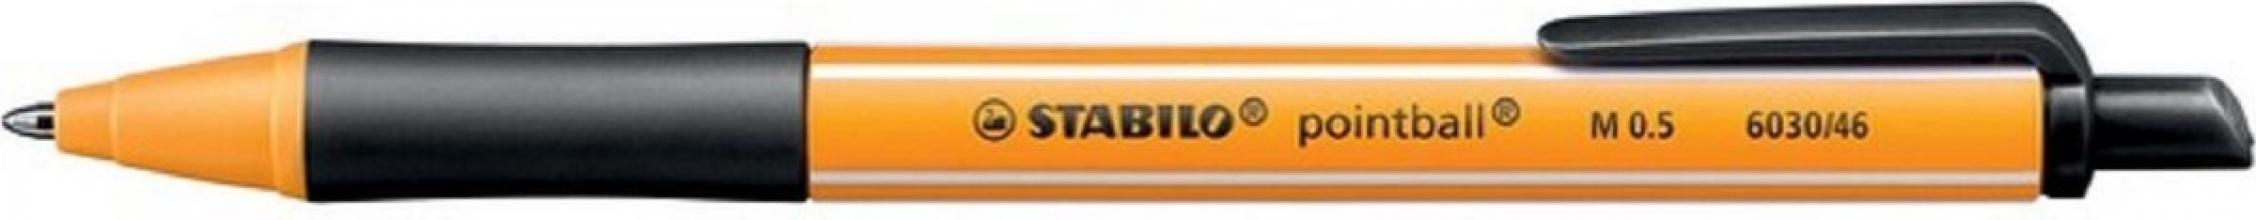 , Balpen STABILO Pointball 6030/46 zwart